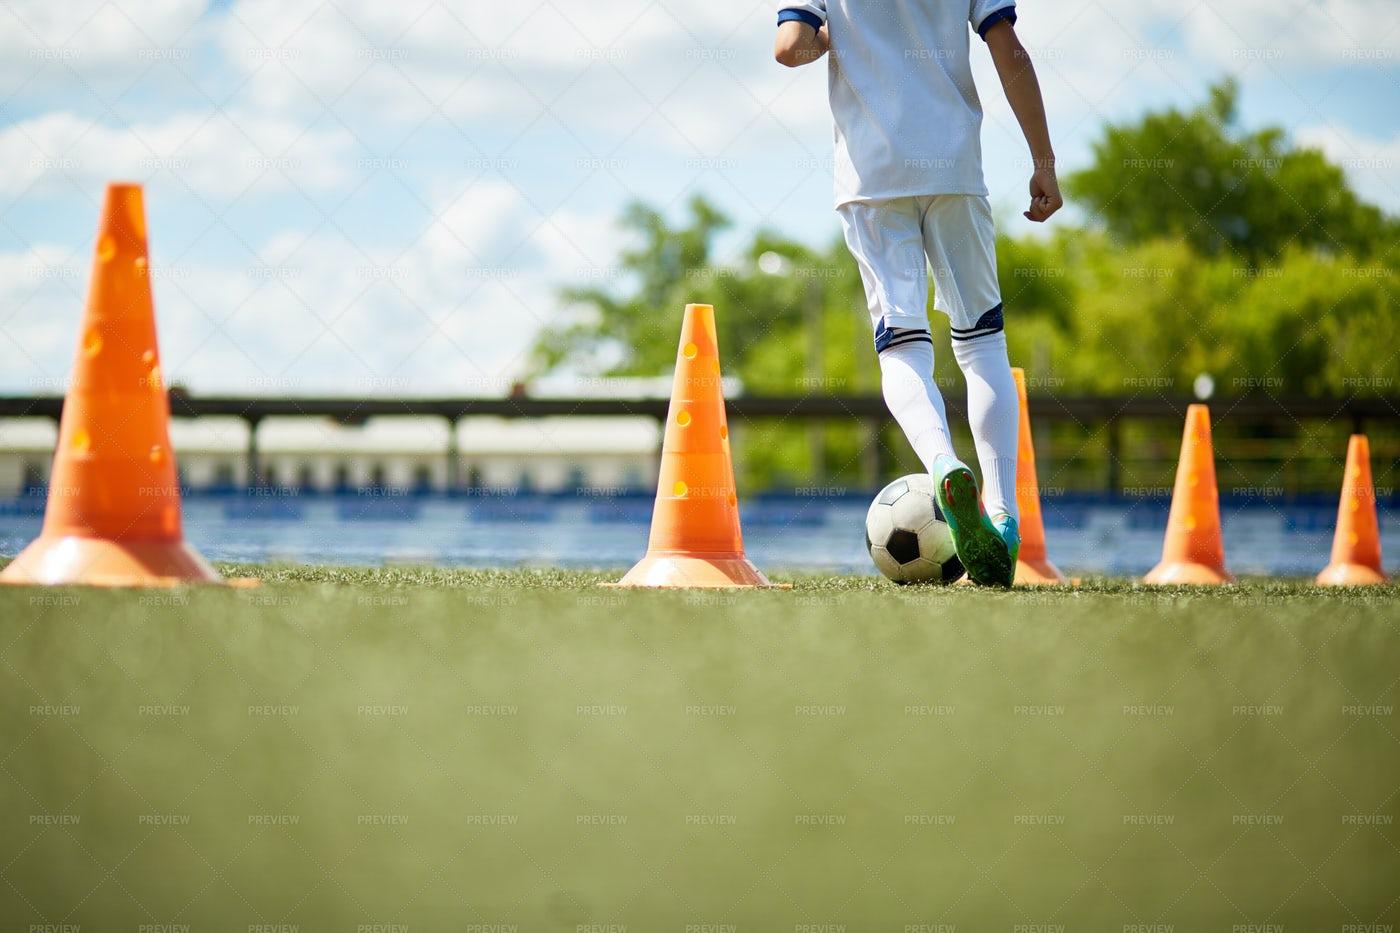 Young Boy In Football Practice: Stock Photos